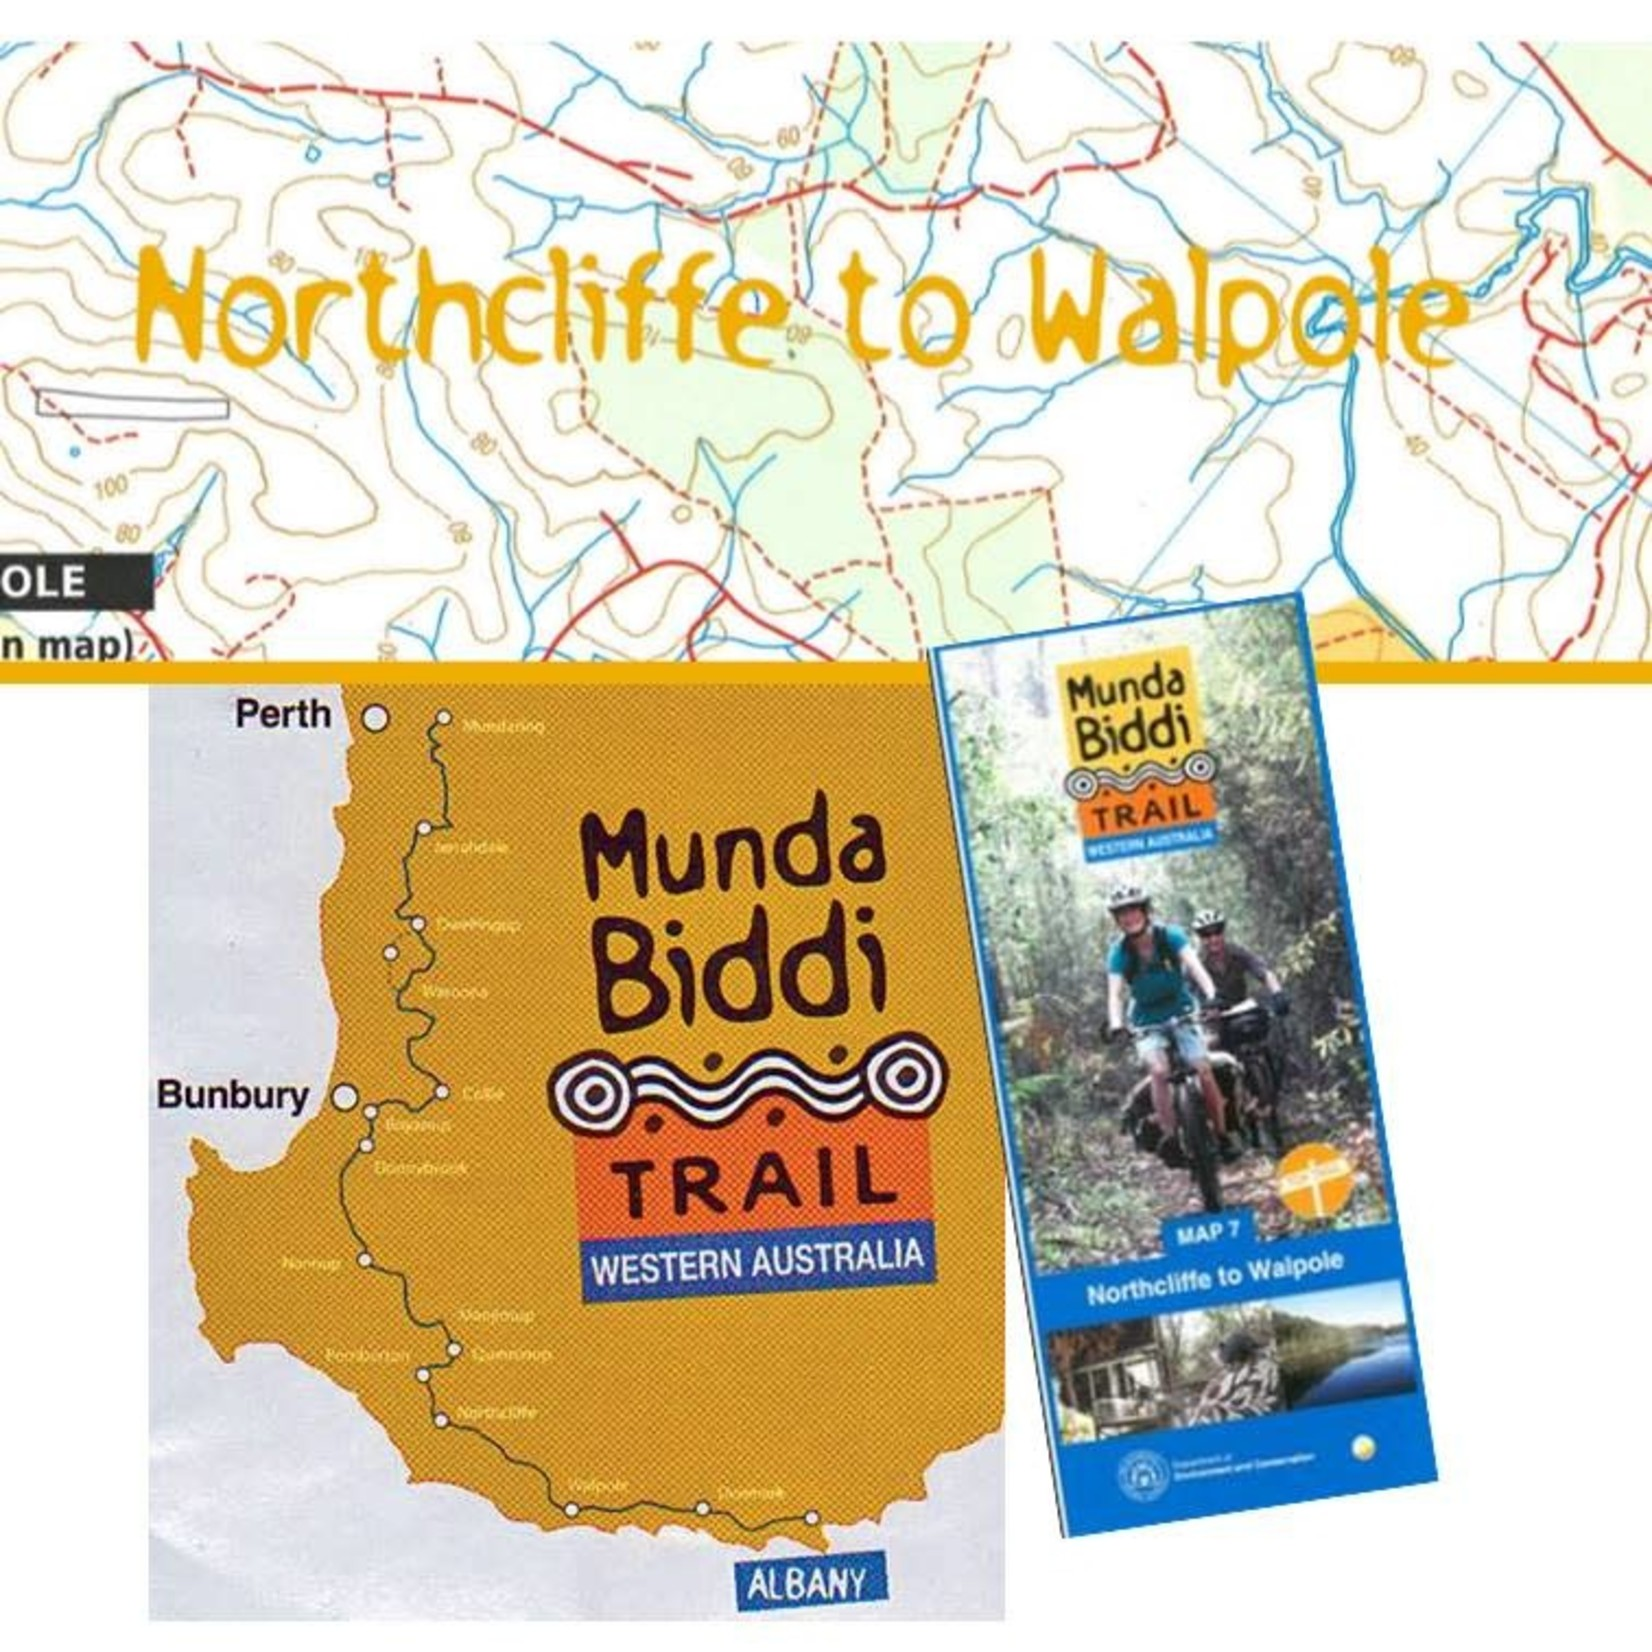 Munda Biddi MTB Trail Map 7